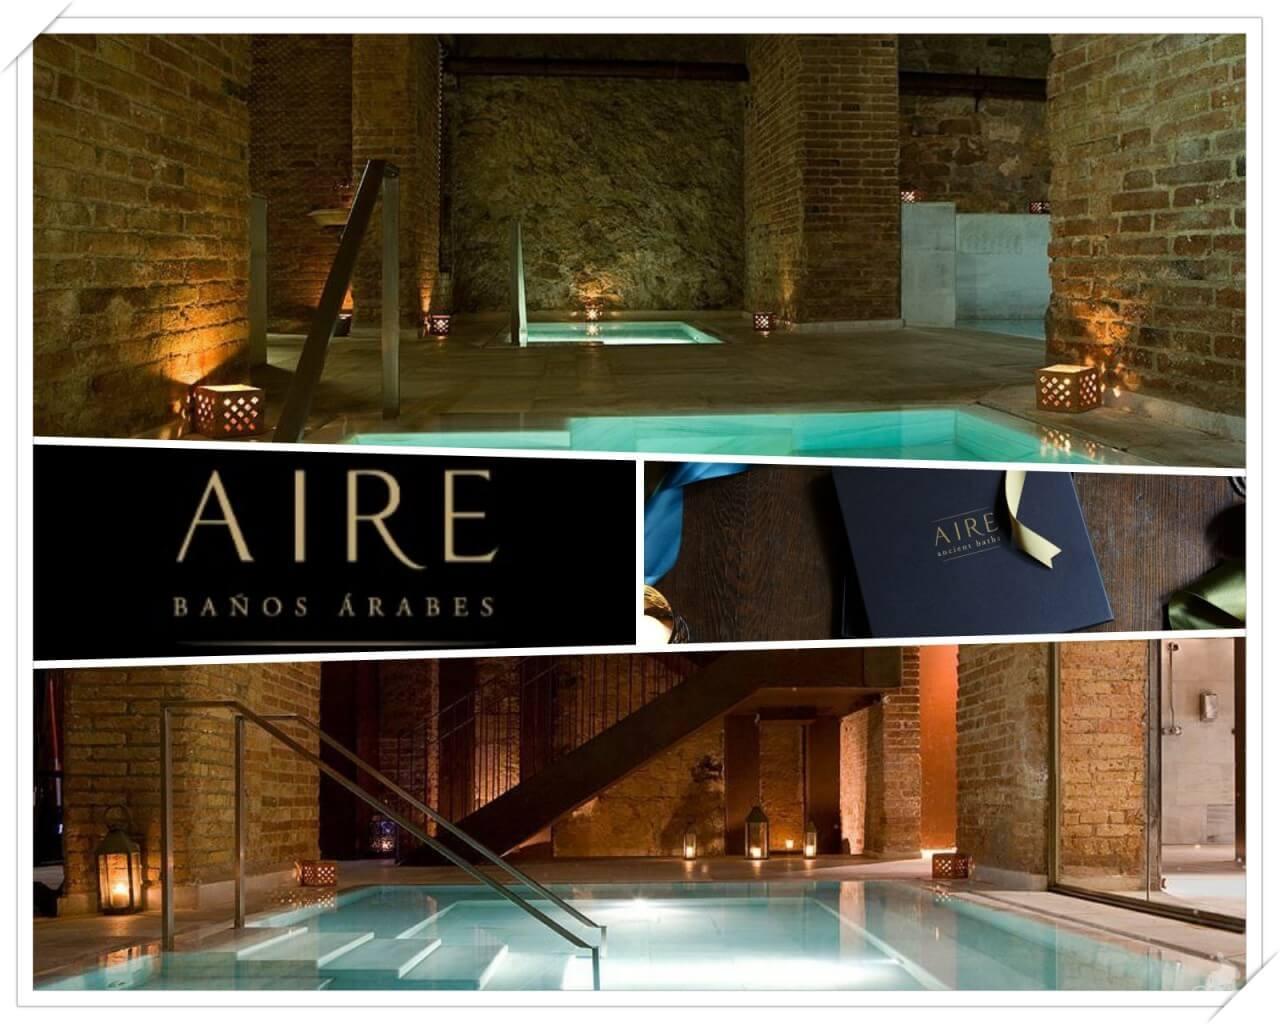 Baños árabes Aire de Barcelona